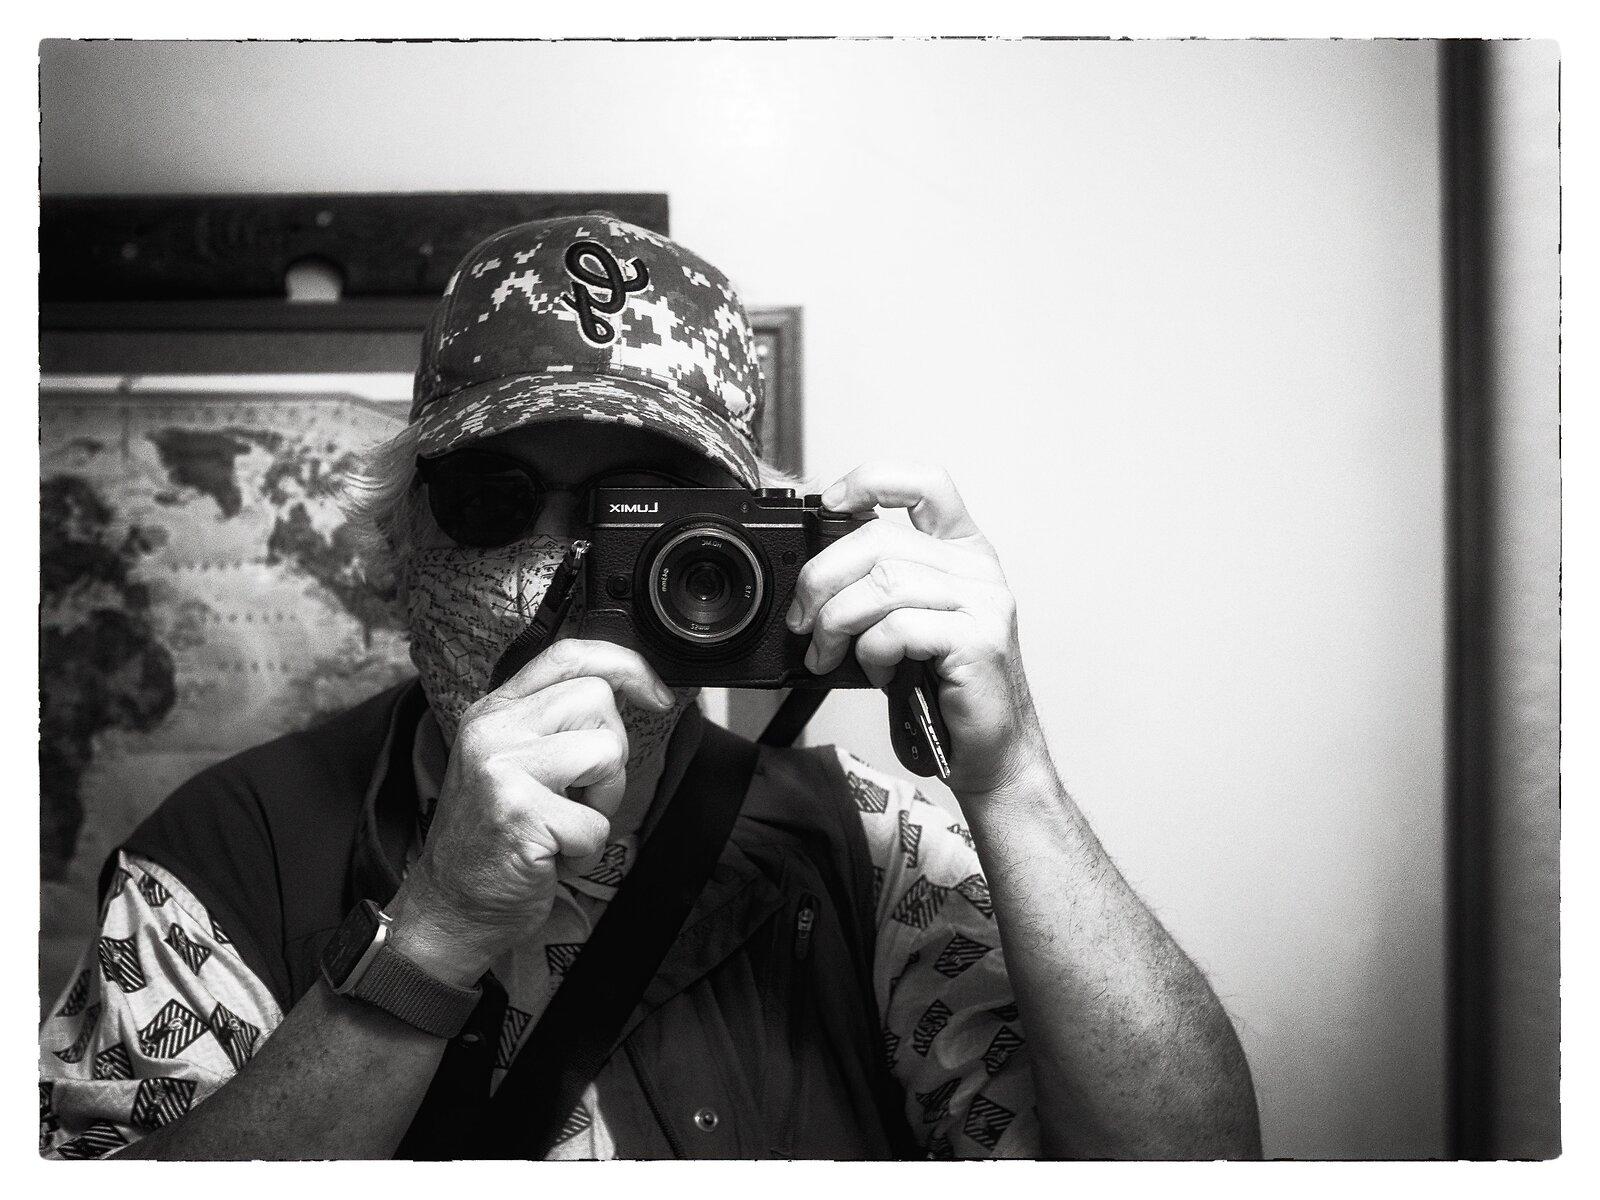 GX8_Aug8_masked_selfportrait_Creswell.jpg